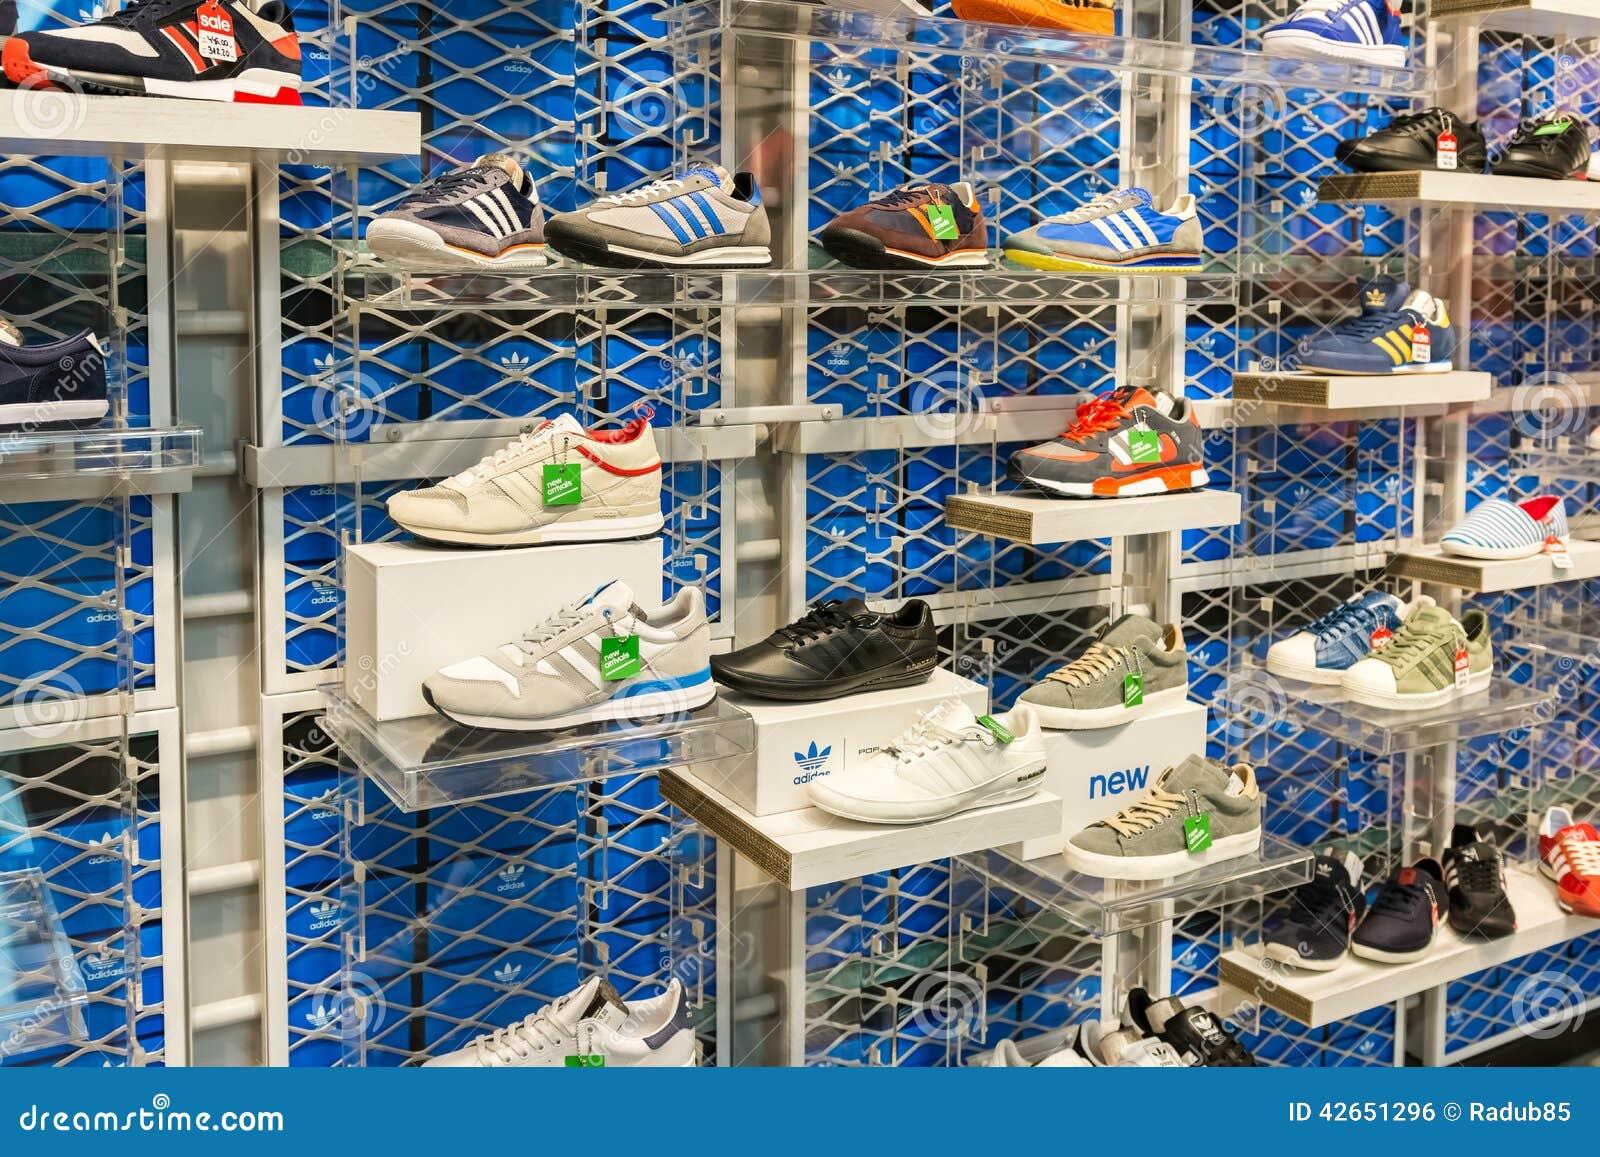 German Shoe Store Chain